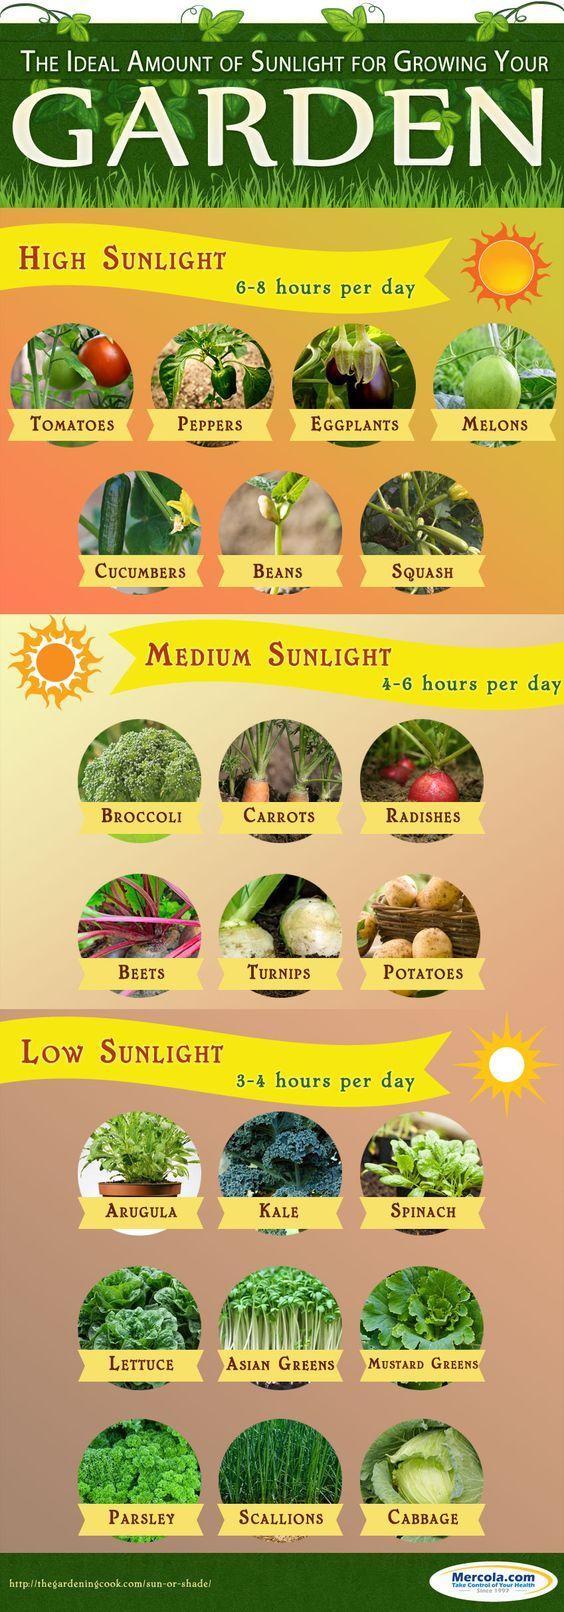 gardening infographic More